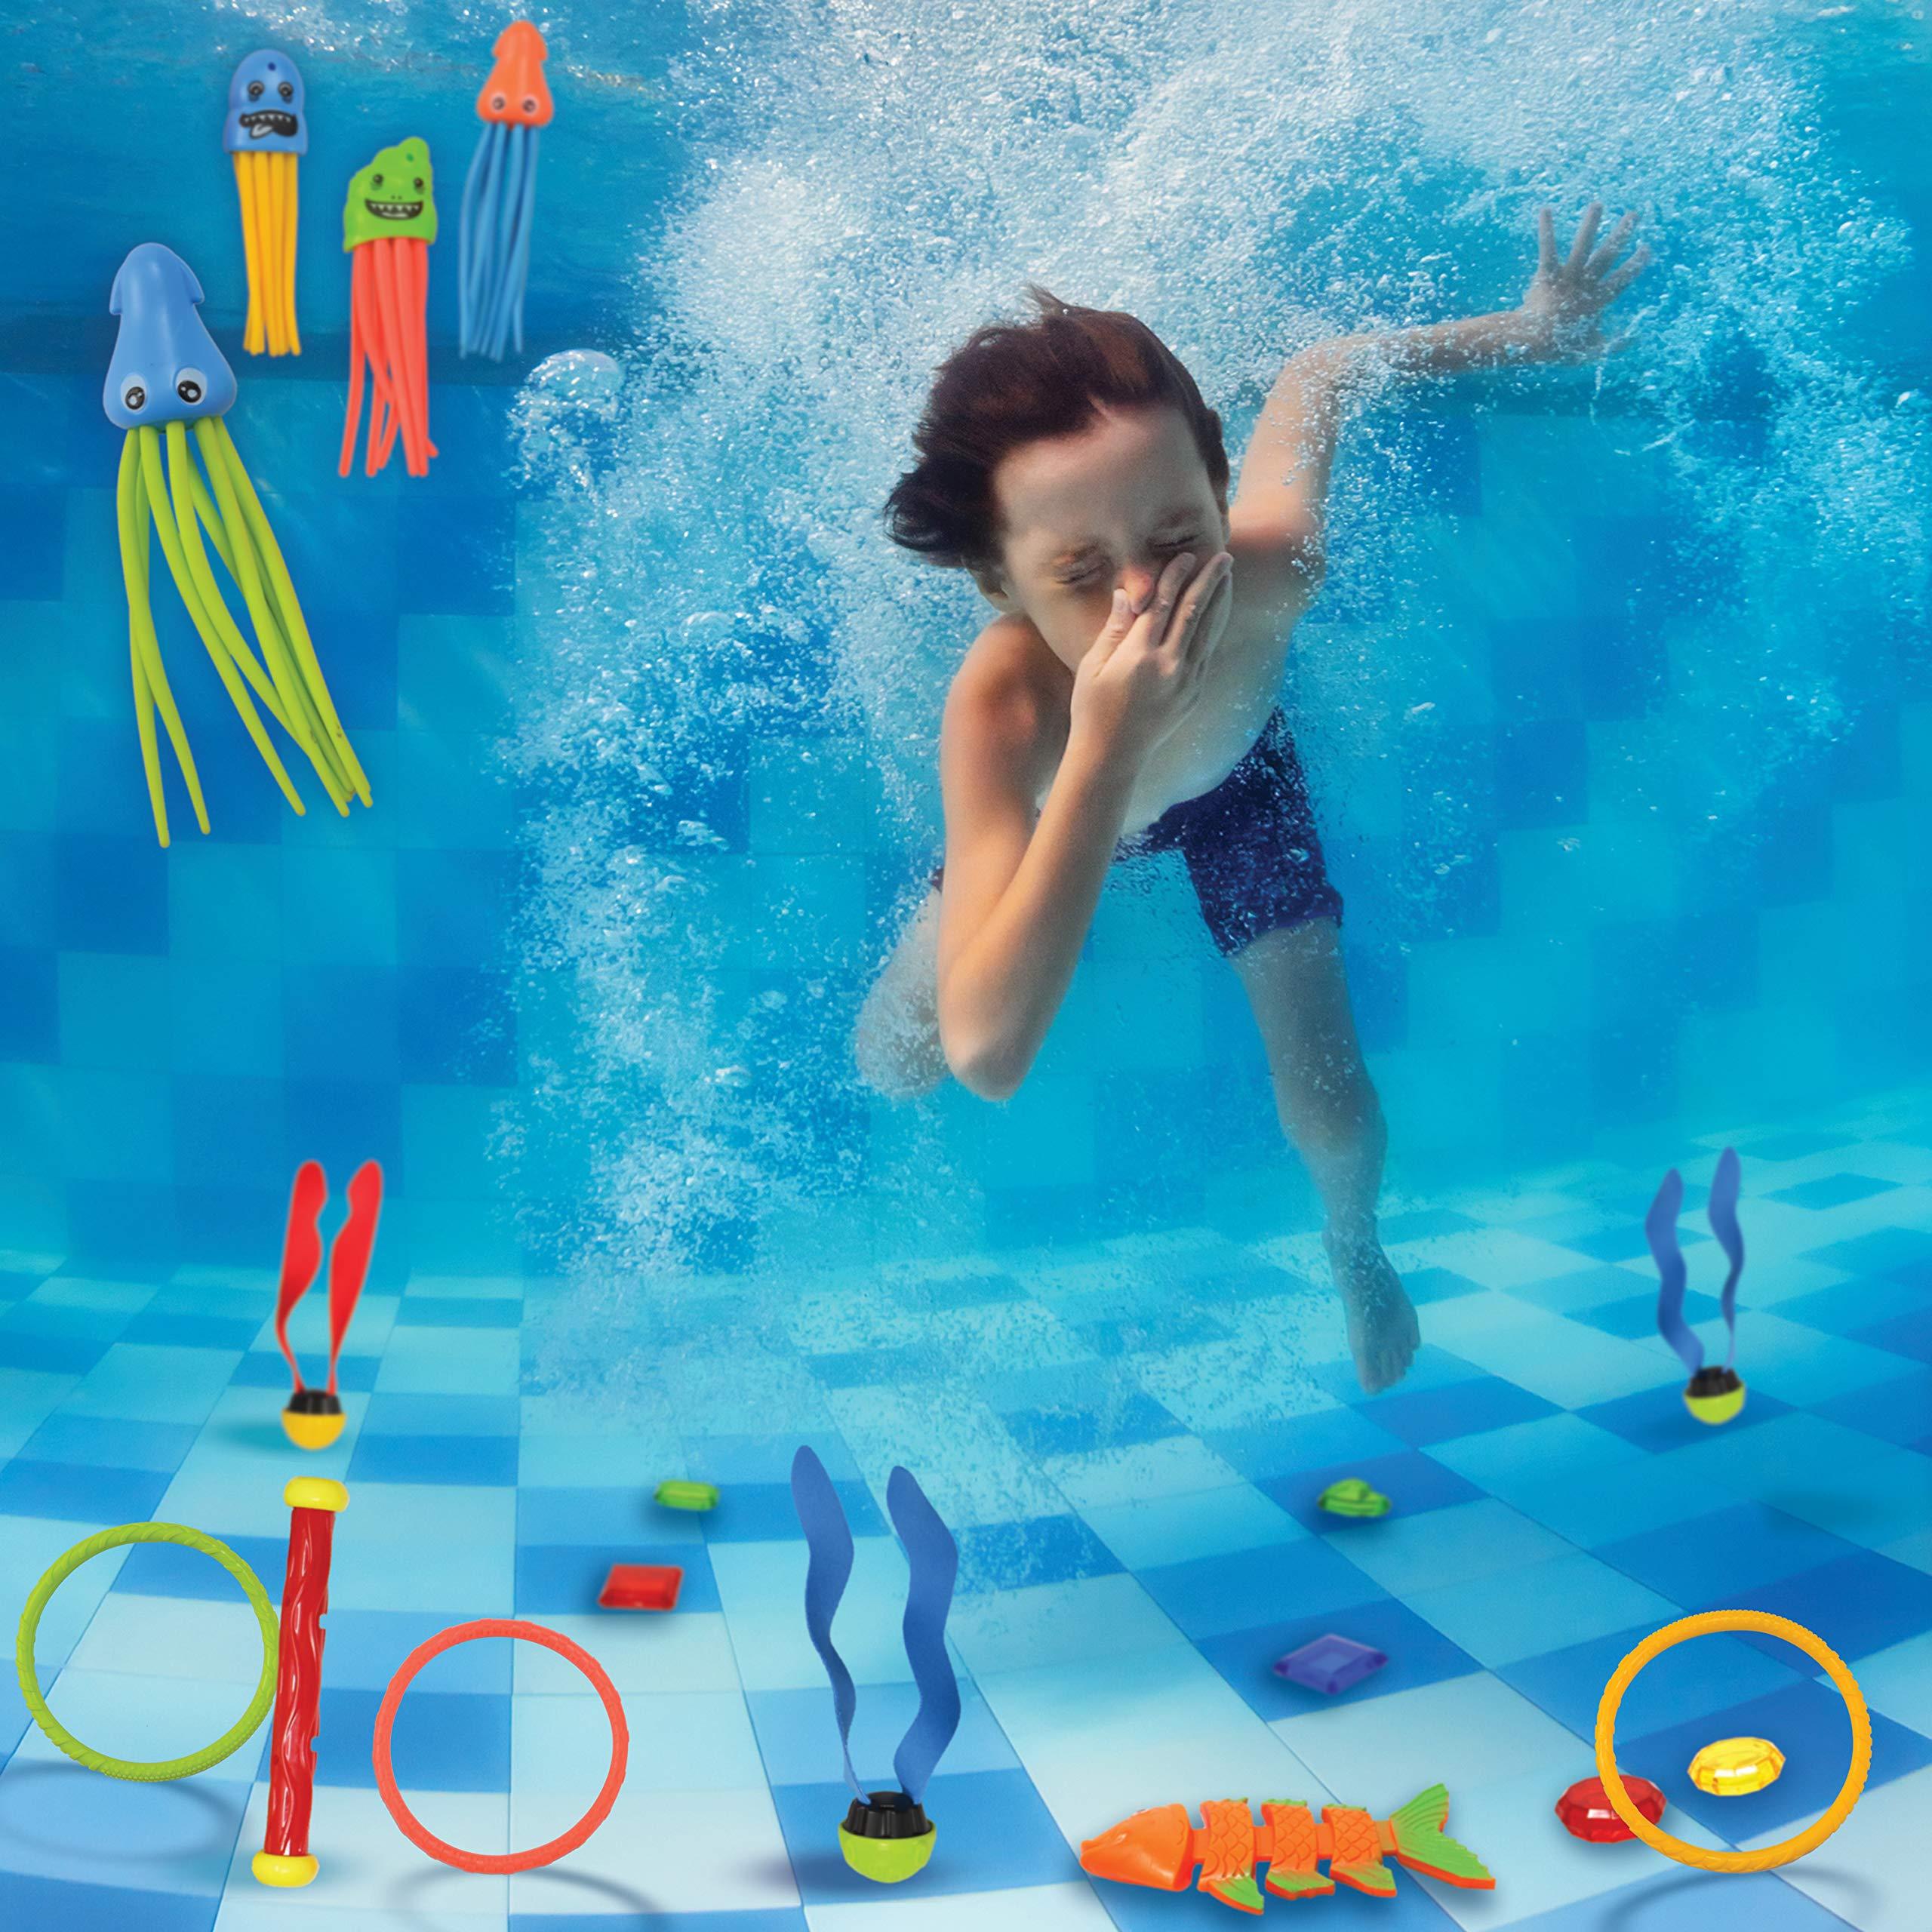 JOYIN 30 Pcs Diving Pool Toys Jumbo Set Includes (5) Diving Sticks, (6) Diving Rings, (5) Pirate Treasures, (4) Toypedo Bandits, (3) Diving Toy Balls, (3) Fish Toys, (4) Stringy Octopus by JOYIN (Image #2)